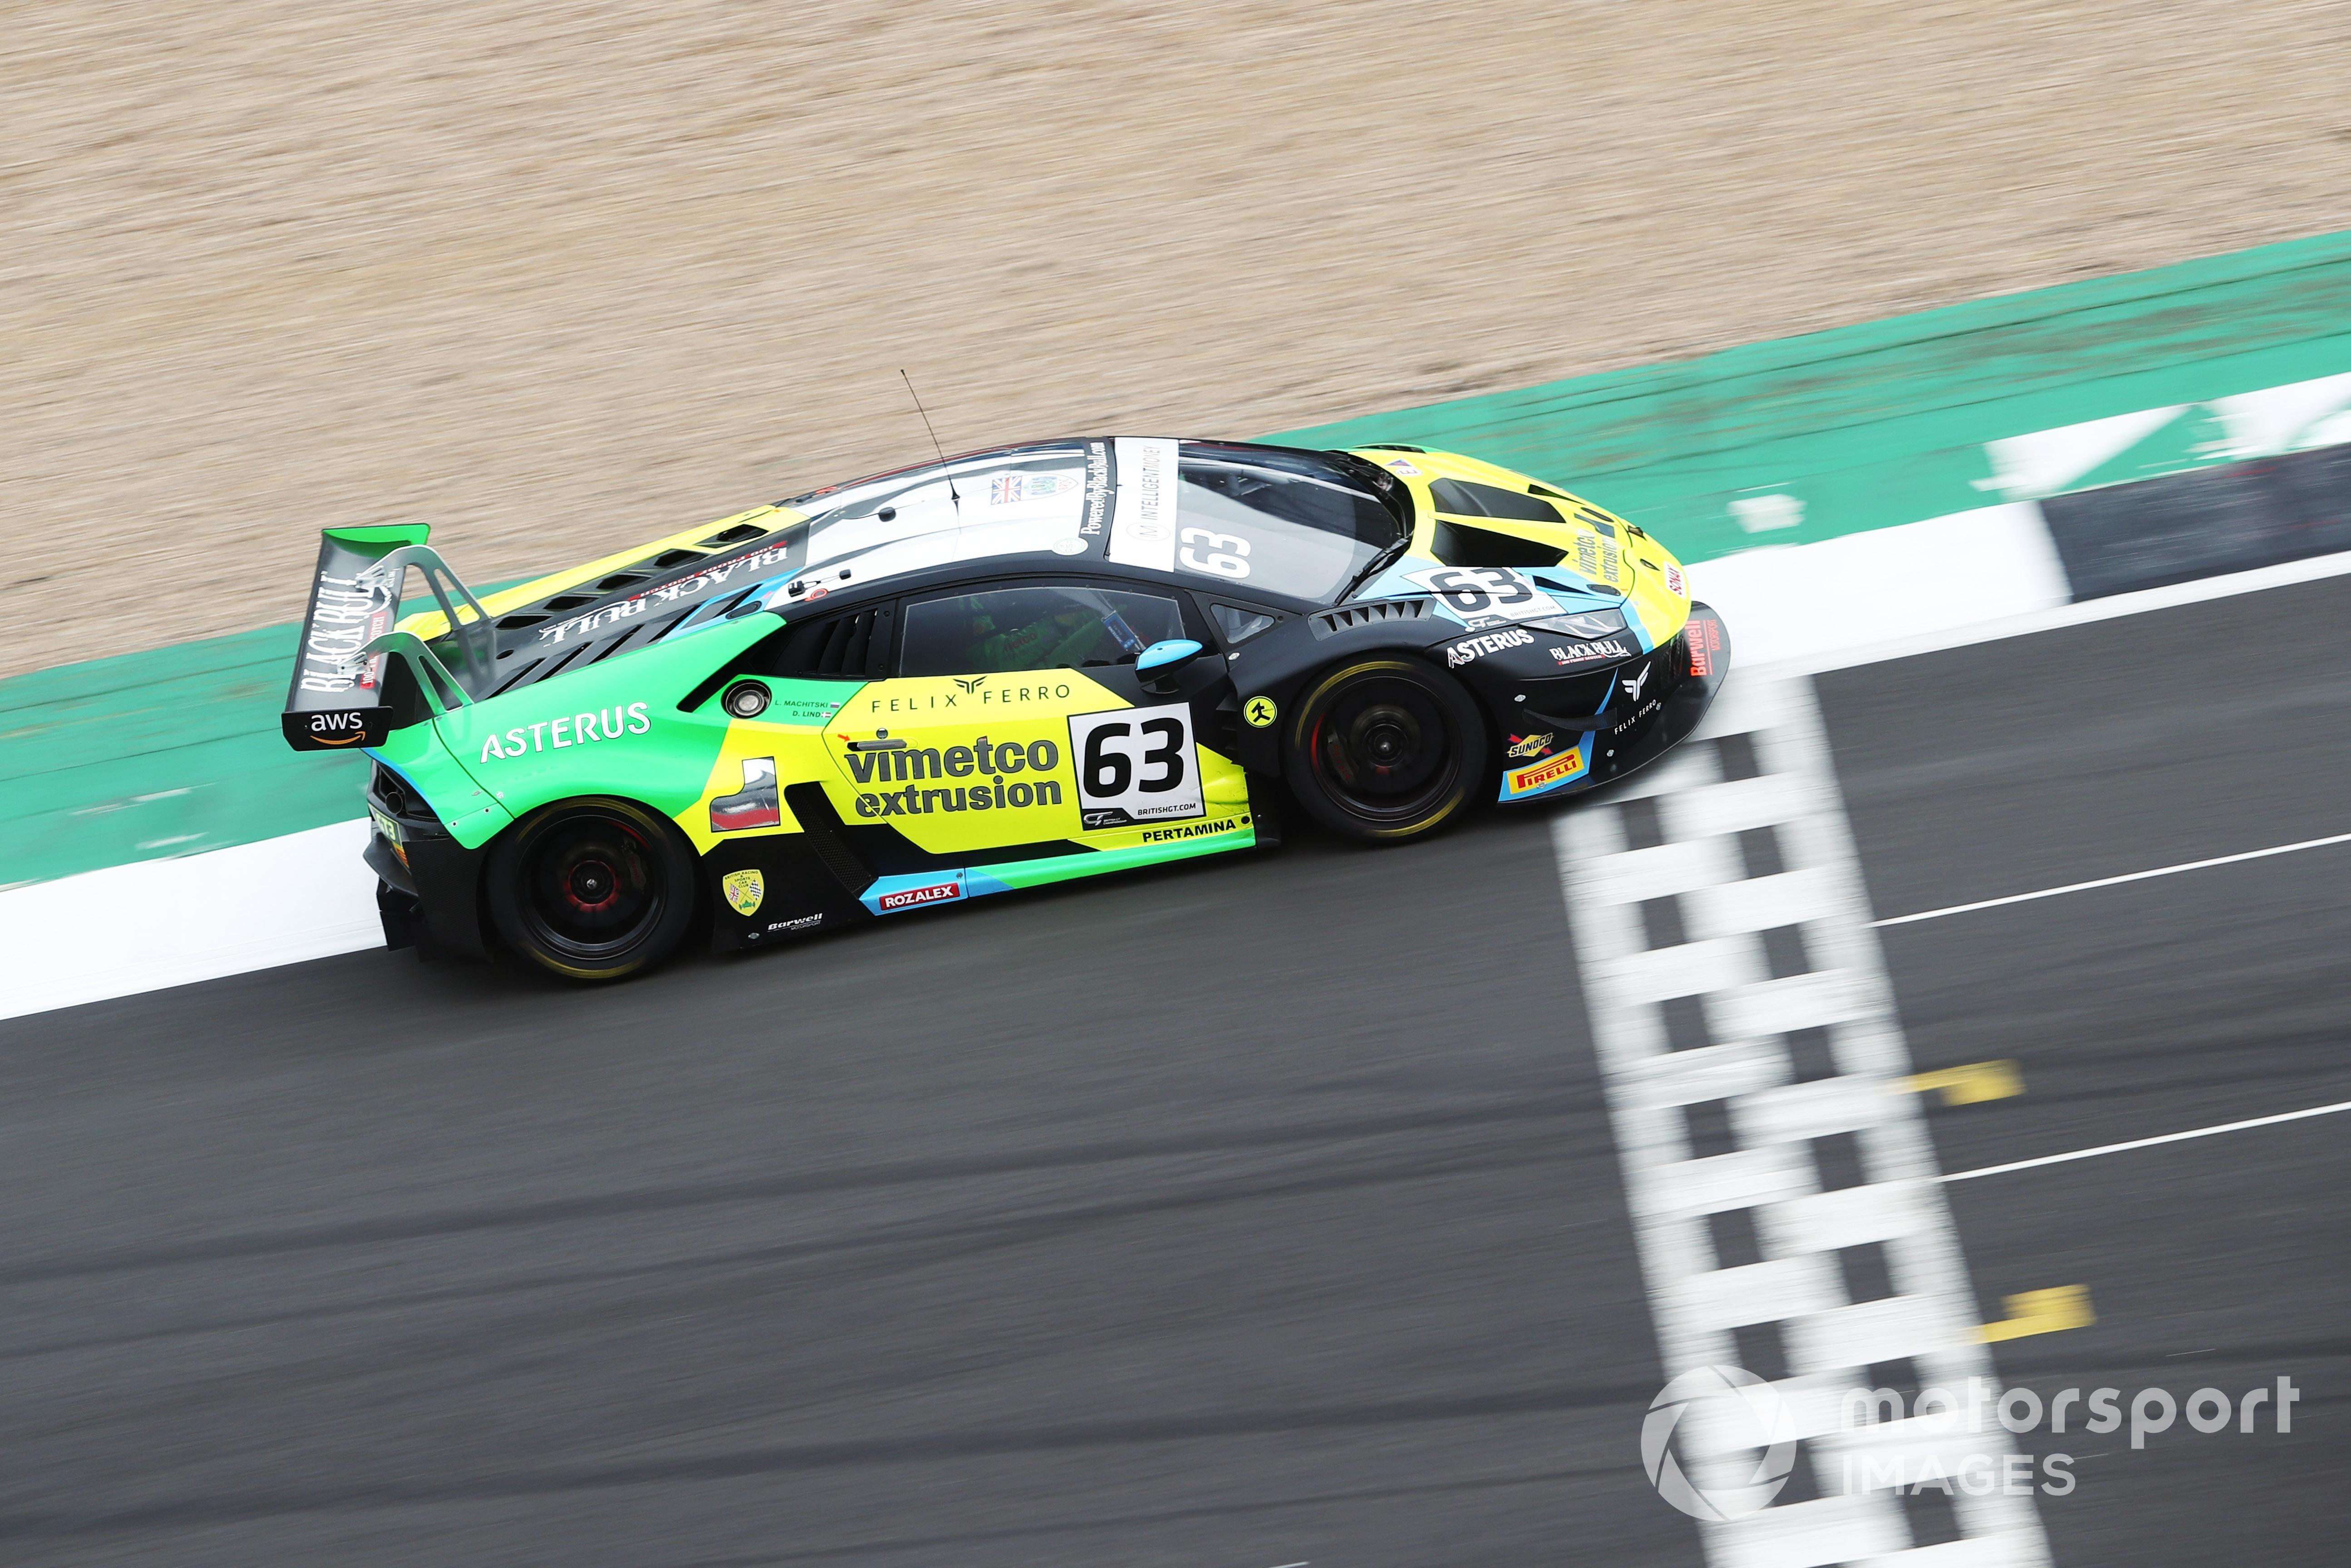 Leo Machitski/Dennis Lind (Lamborghini Huracan Evo GT3), British GT, Silverstone 2021